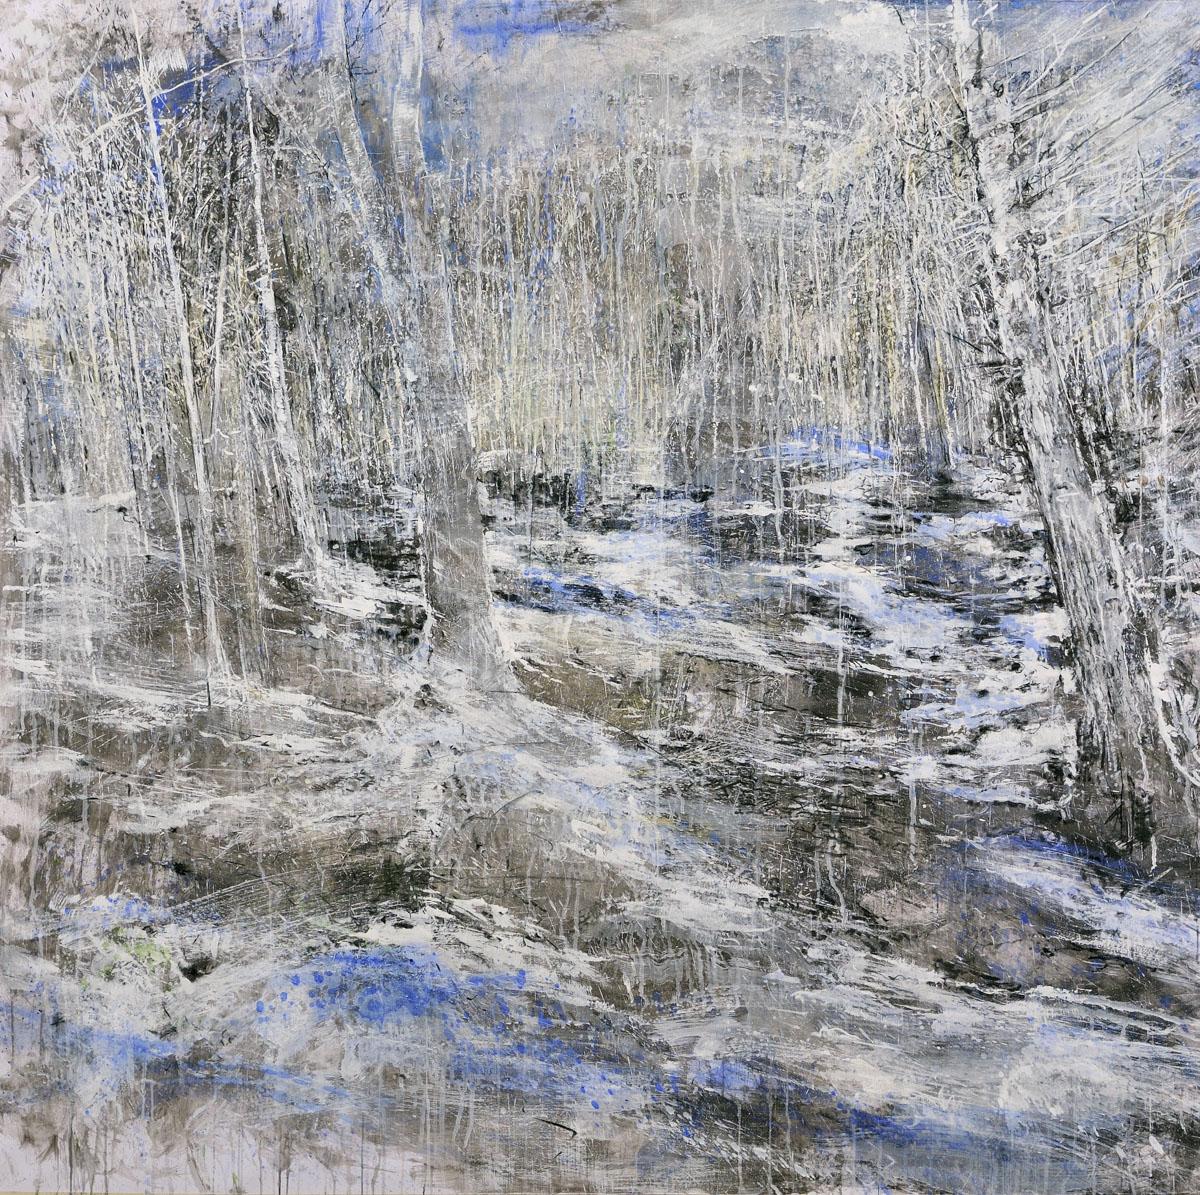 #2 Winterreise - 2020 grafite, fusaggine, pigmento, acrilico,olio su carta 150x150